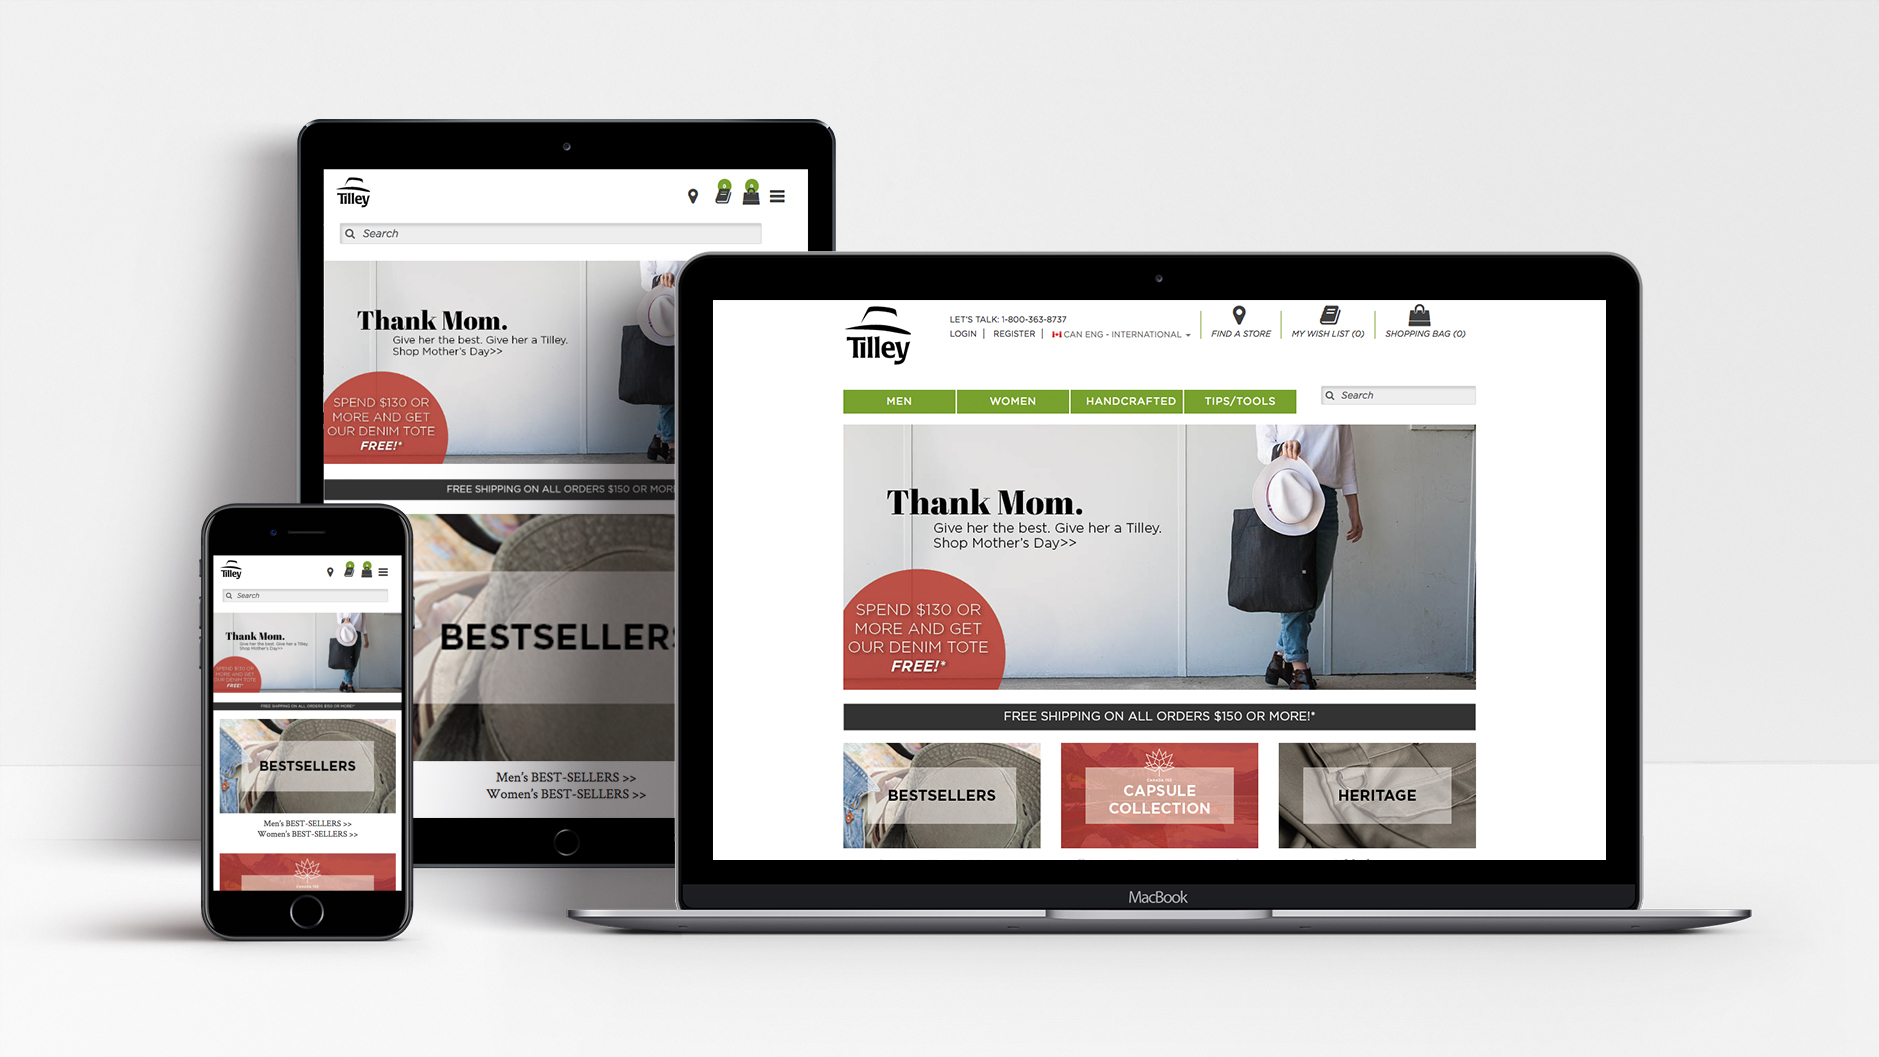 Tilley | Tilley Endurables – Website | E-Commerce, Magento, Mobile, Website Design & Development